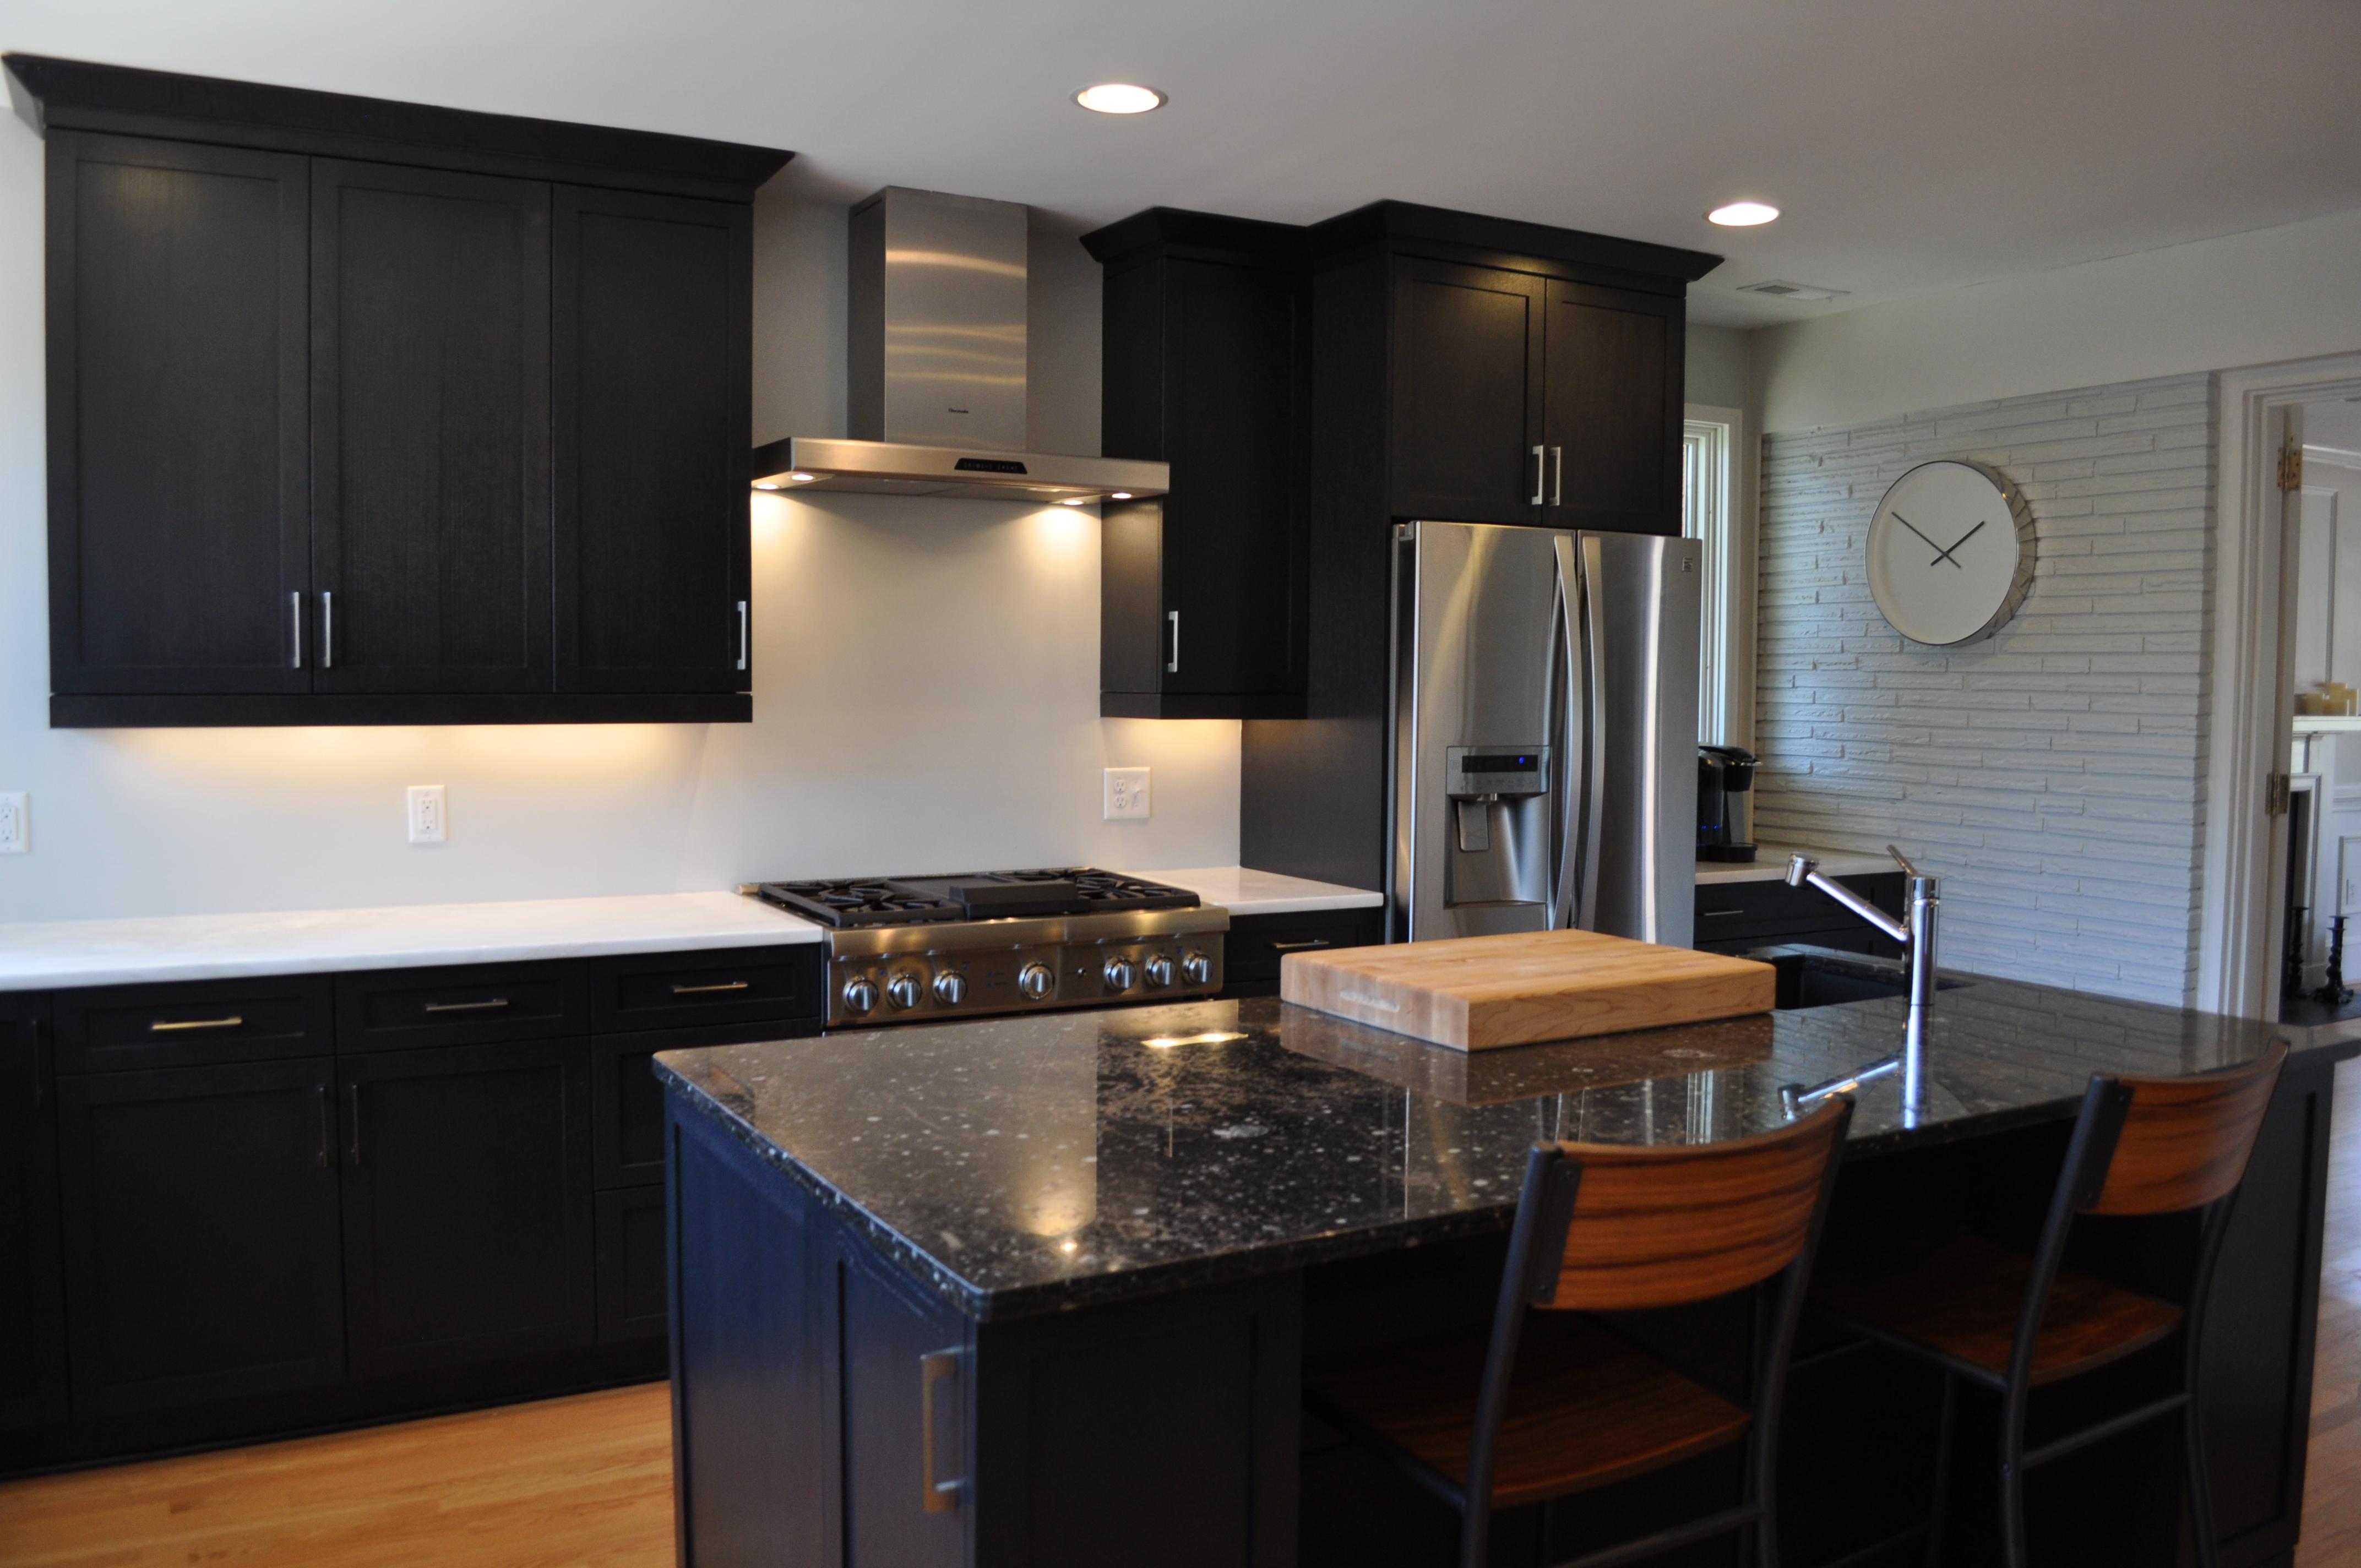 3 kitchen craft cabinets KIT 6